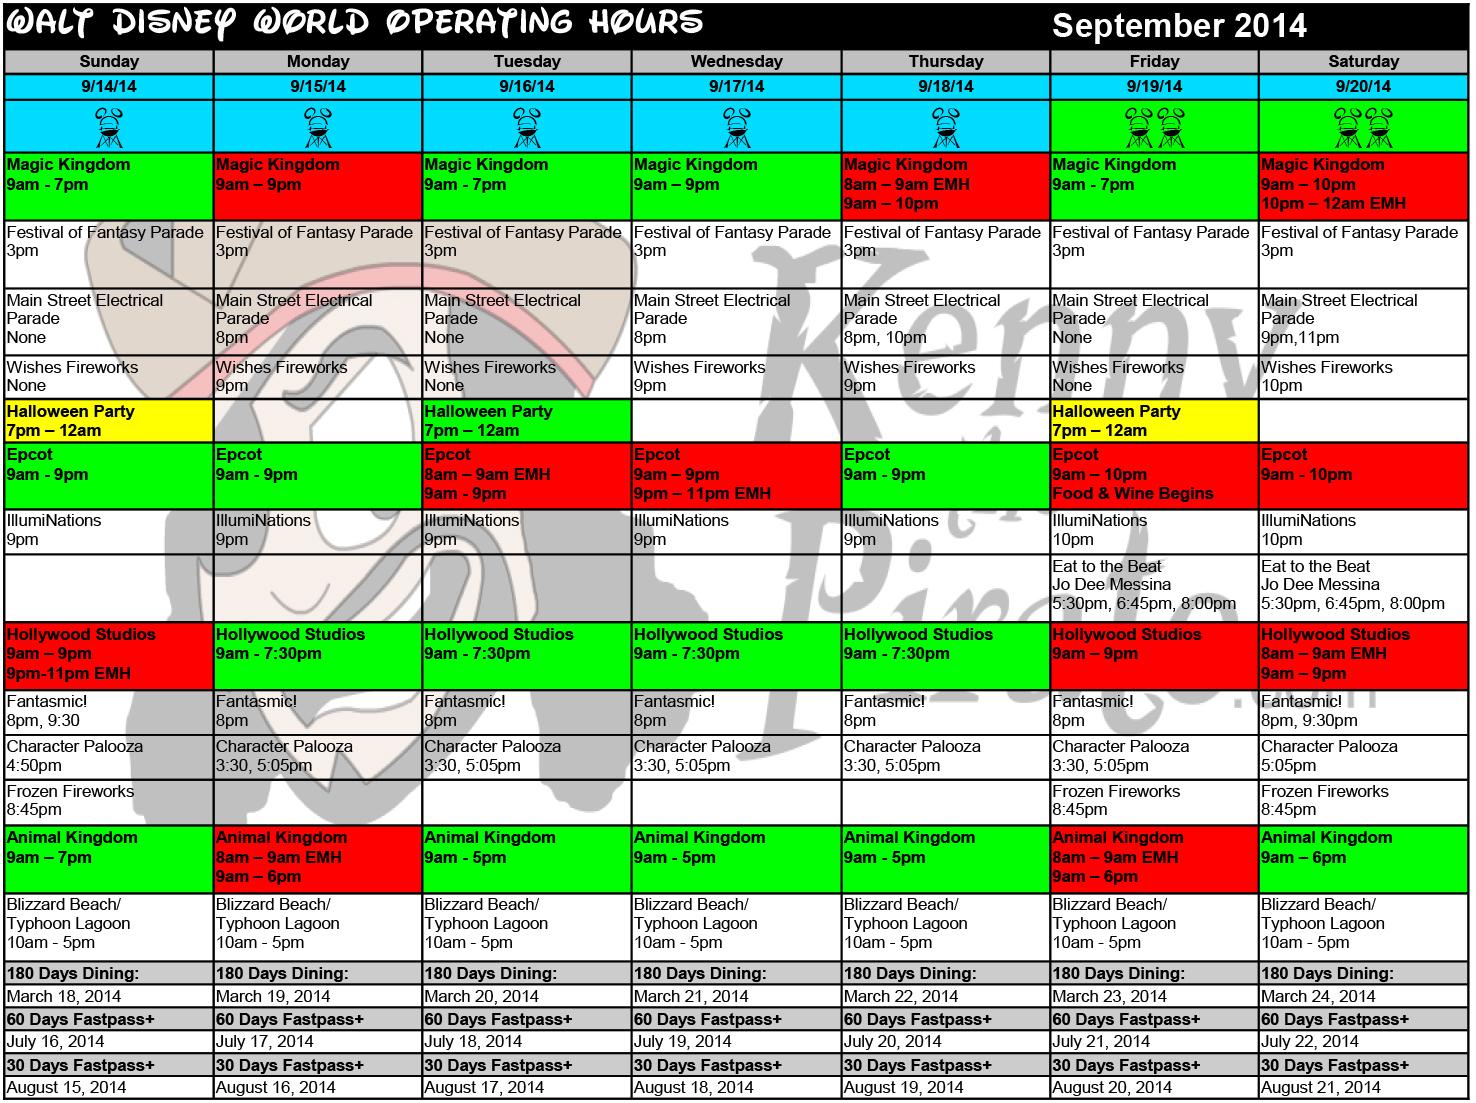 September 2014 Disney World Crowd Calendar Park Hours KennythePirate